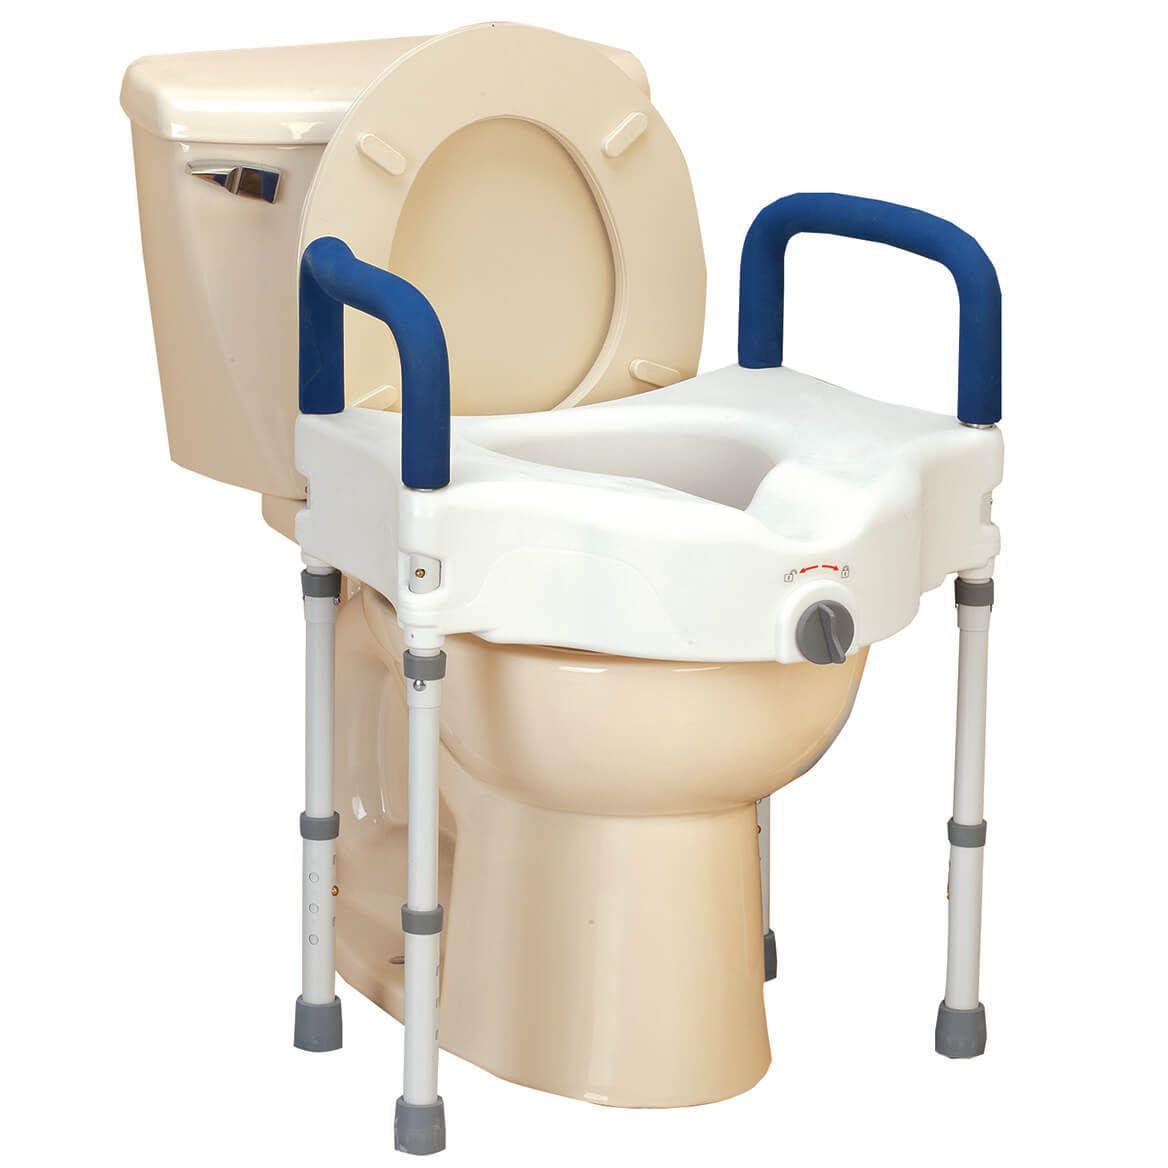 Bariatric Raised Toilet Seat With Arms Toilet Seats 171540